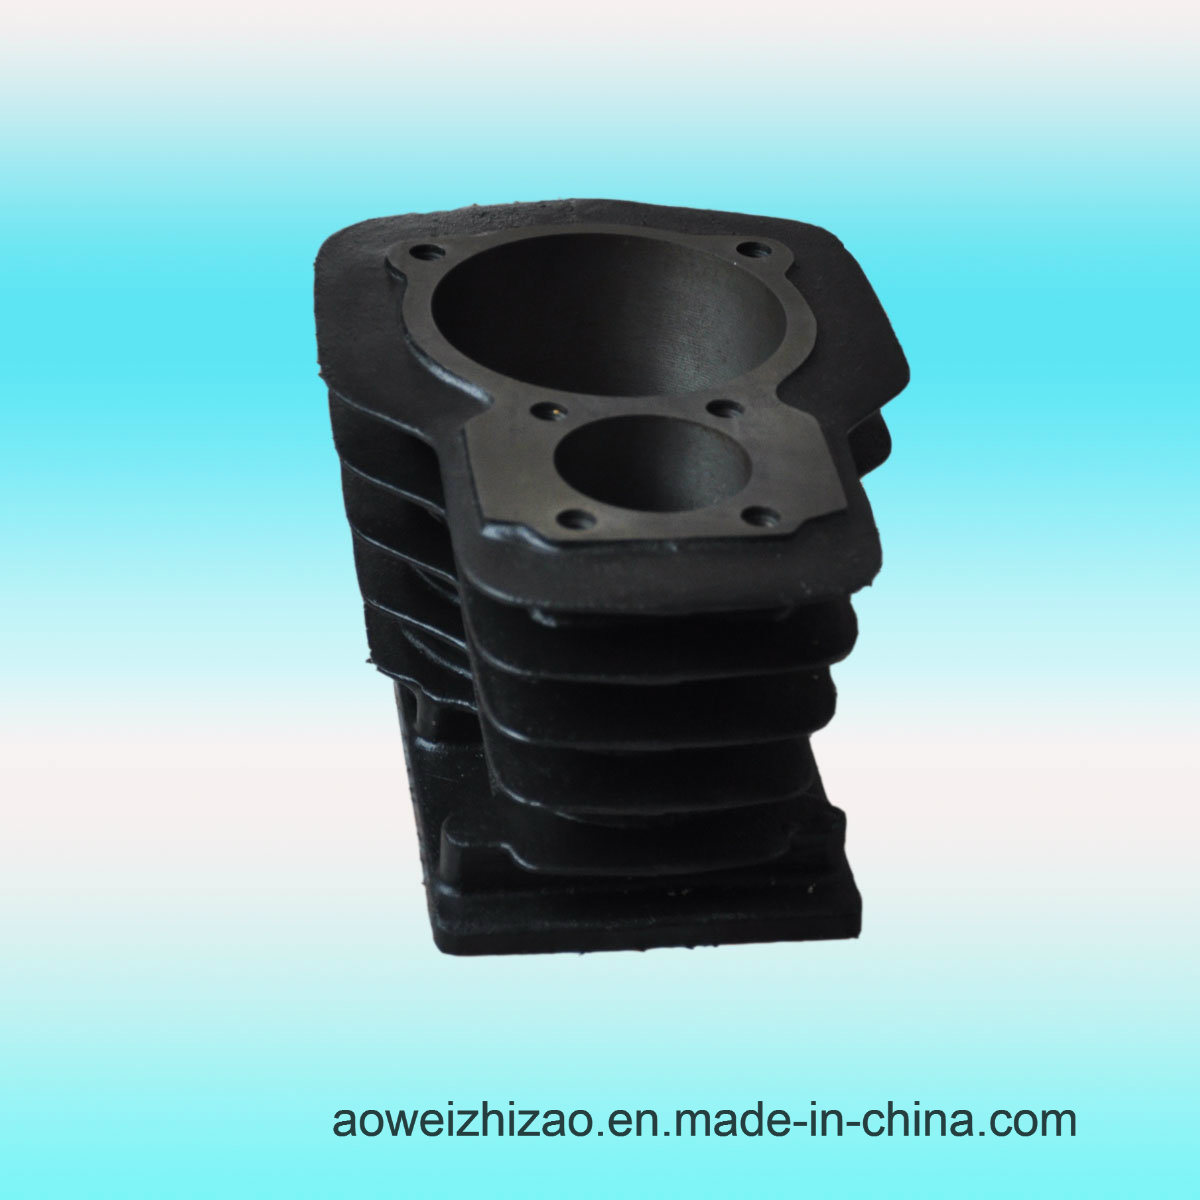 Cylinder Liner, Cylinder Sleeve, EPC, Gray Iron, Ductile Iron, ISO9001: 2008, Awgt-003